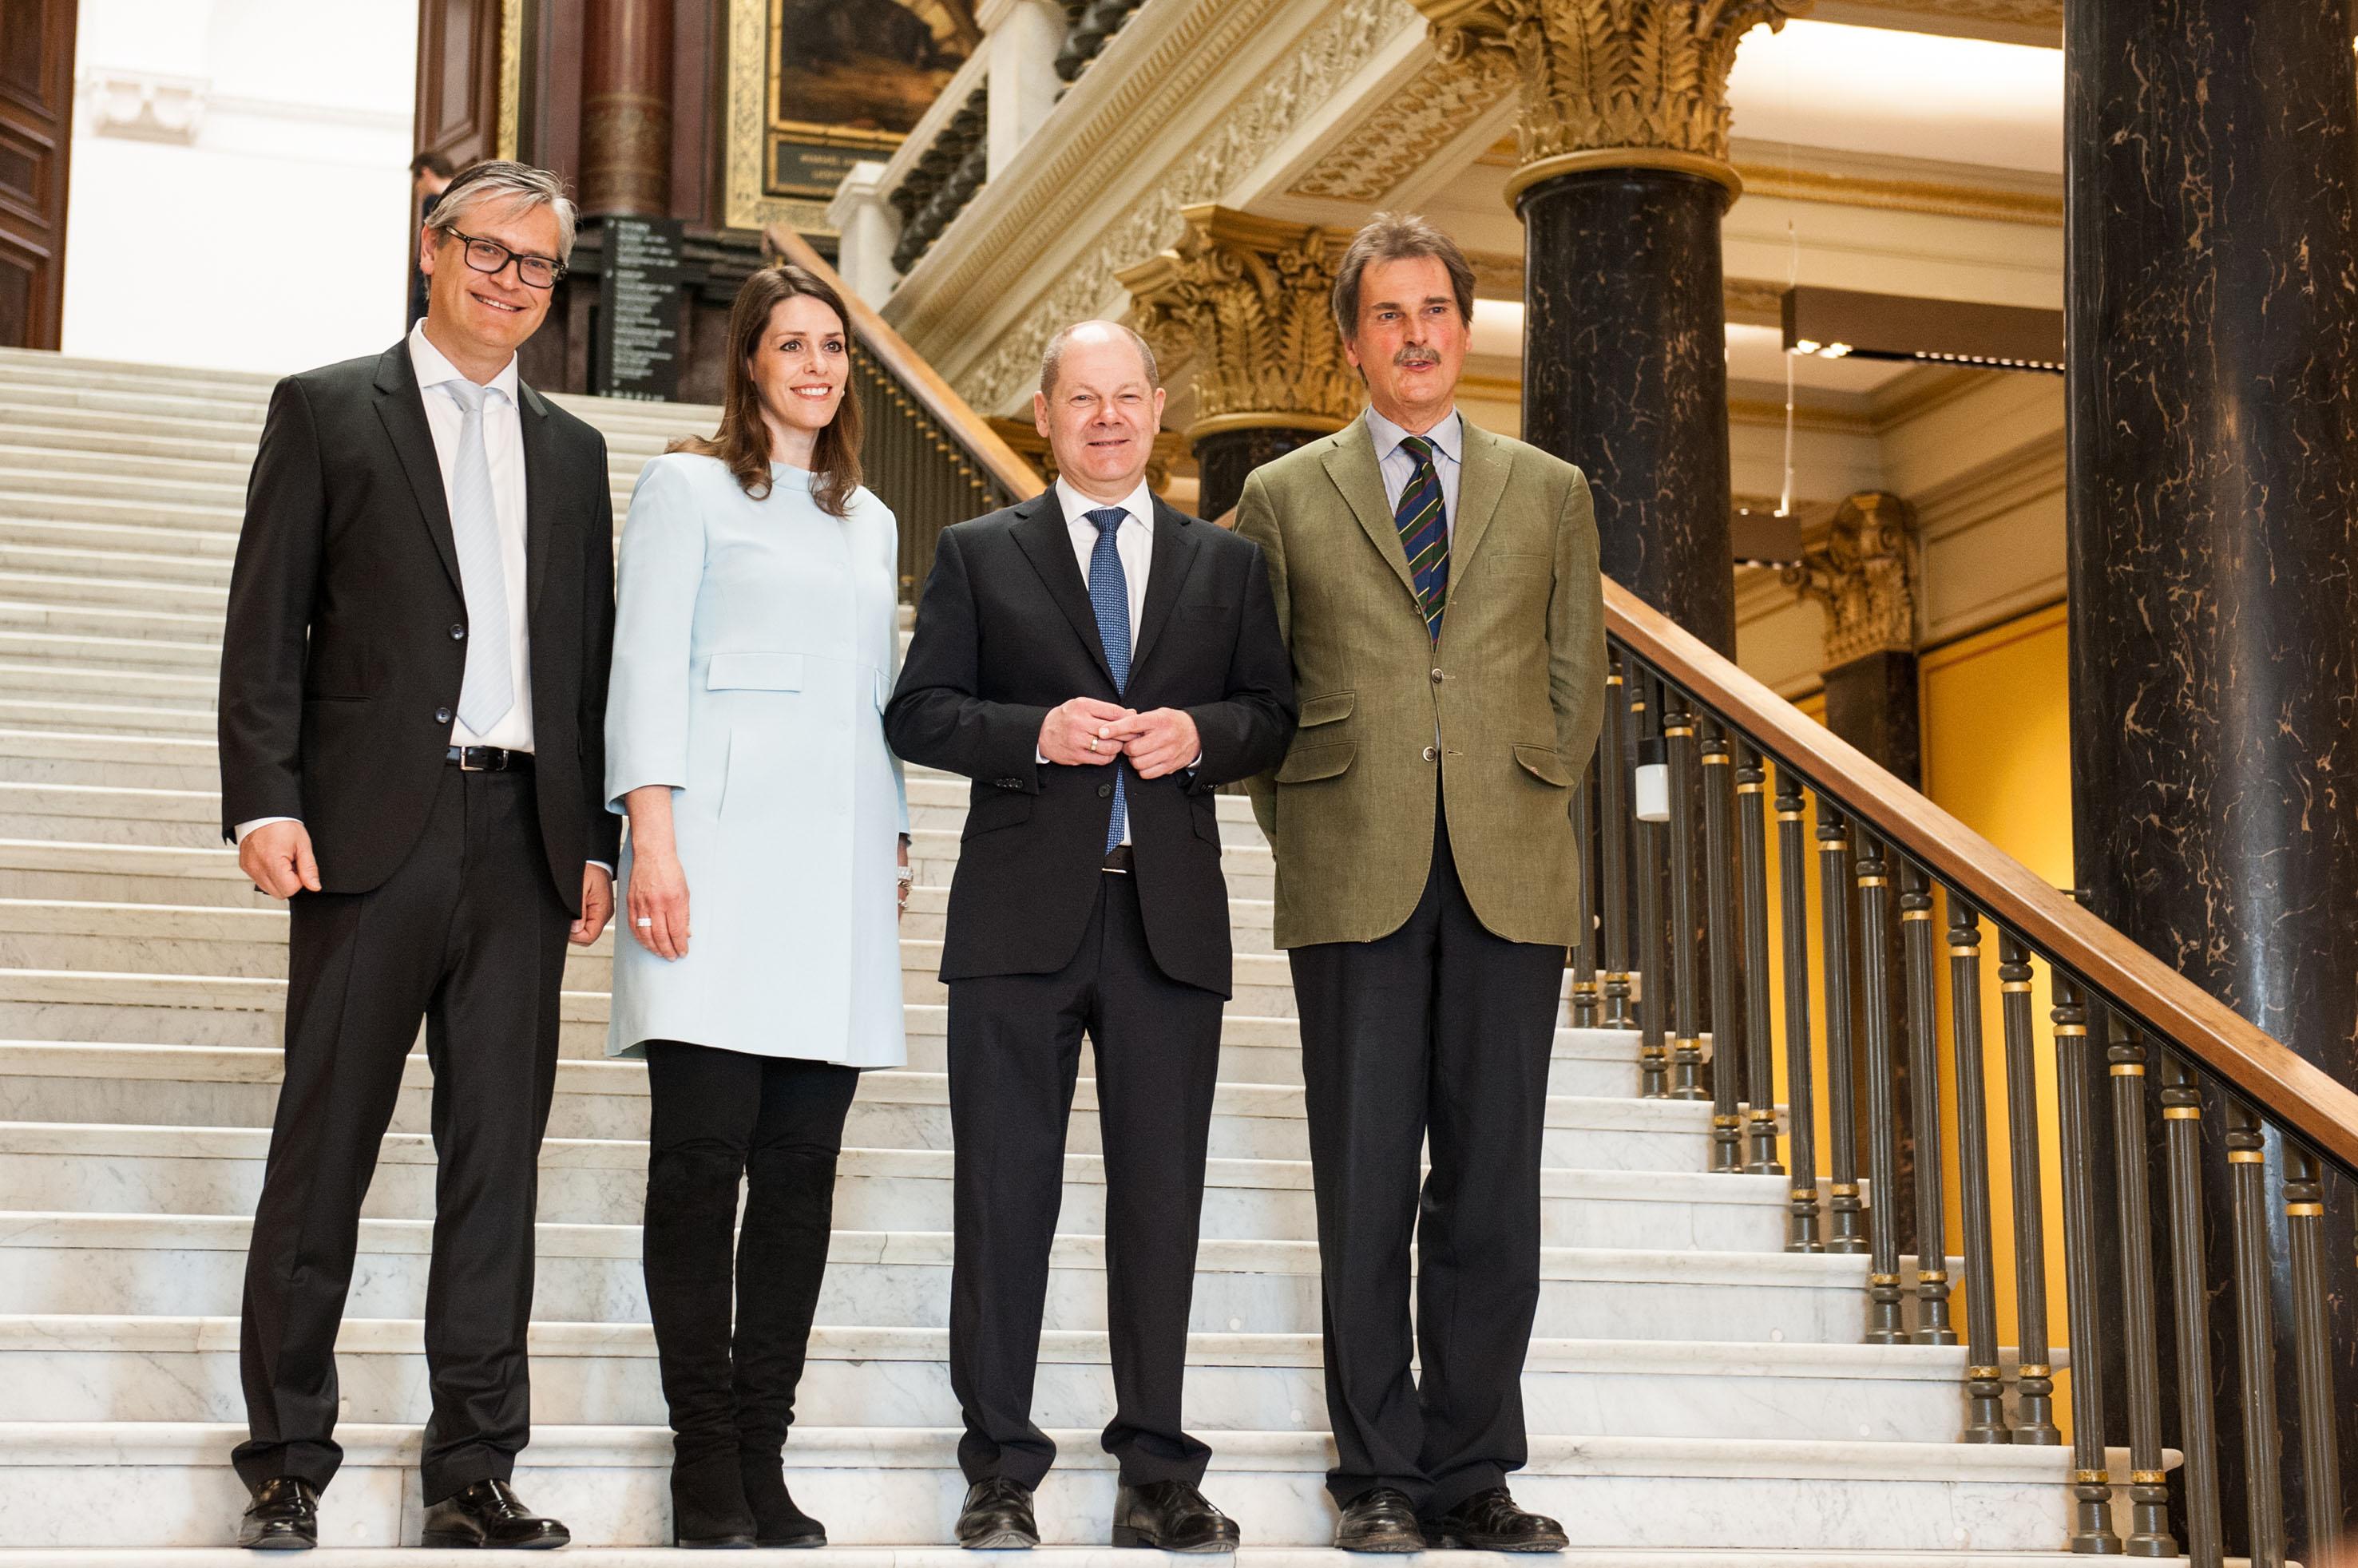 Alexander Otto, Dorit Otto, Olaf Scholz, Prof. Dr. Hubertus Gaßner (vlnr)